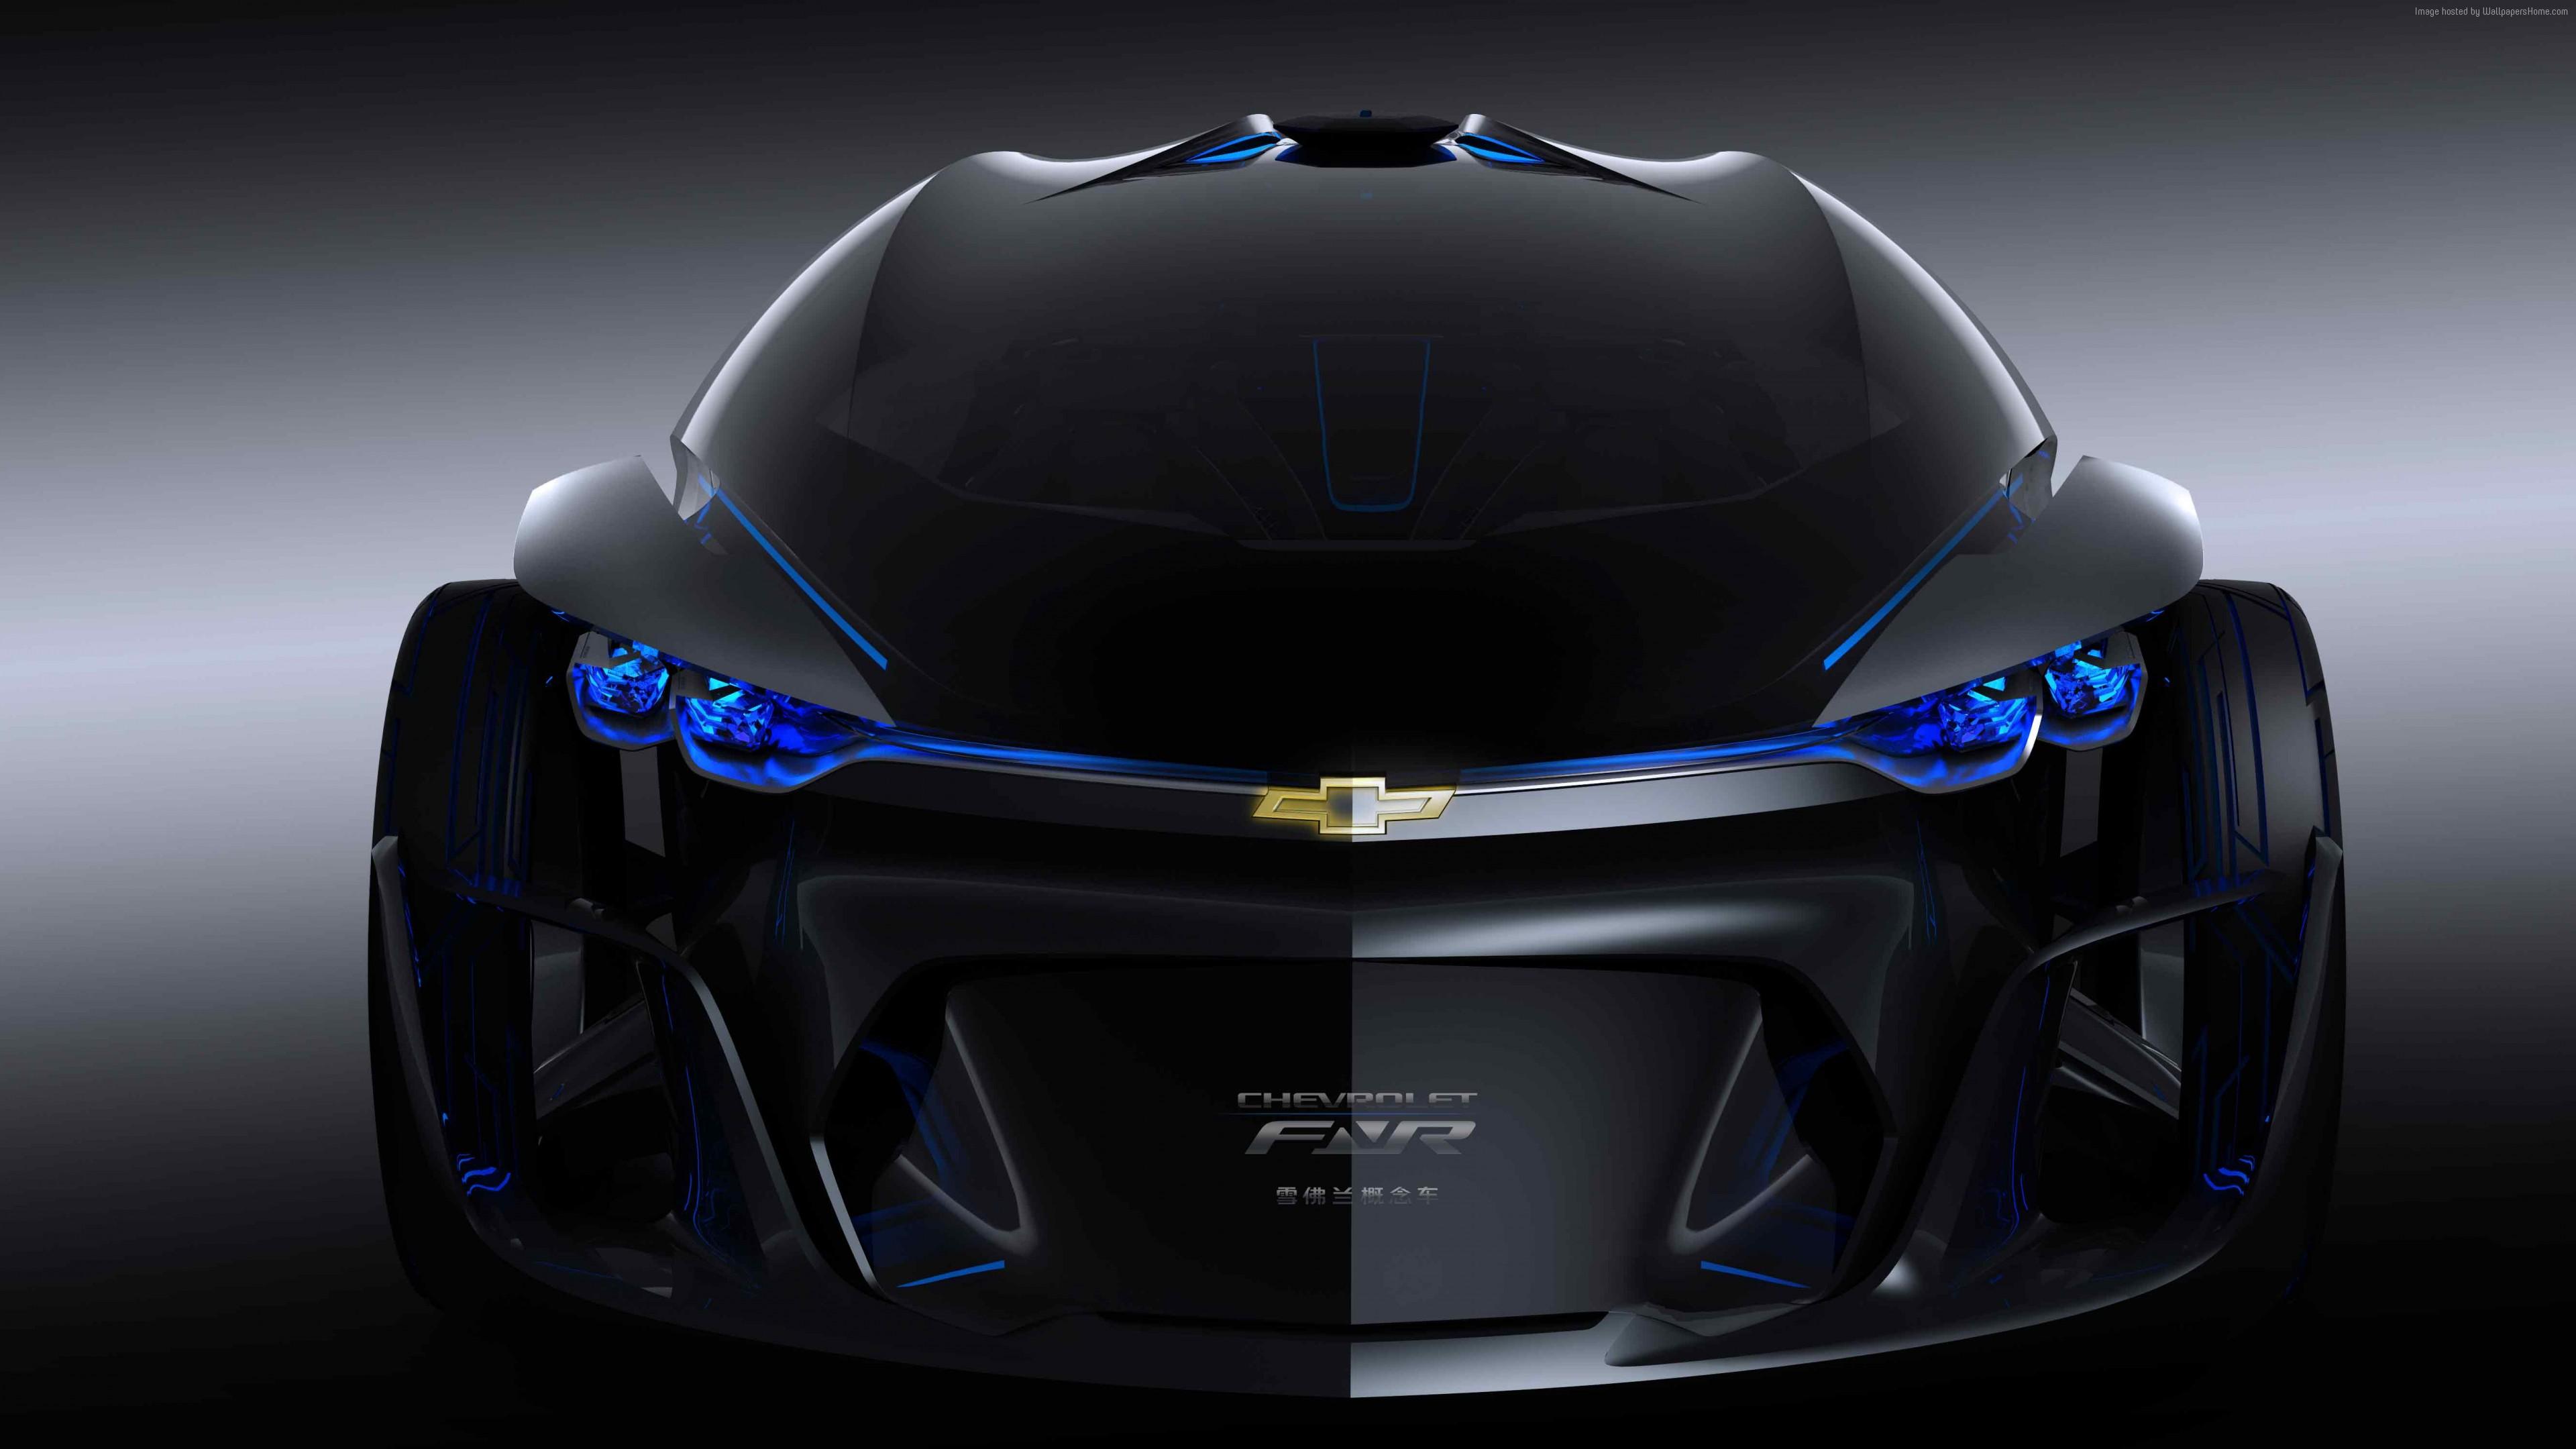 2048x1152 Chevrolet Futuristic Concept Car 2048x1152 ...